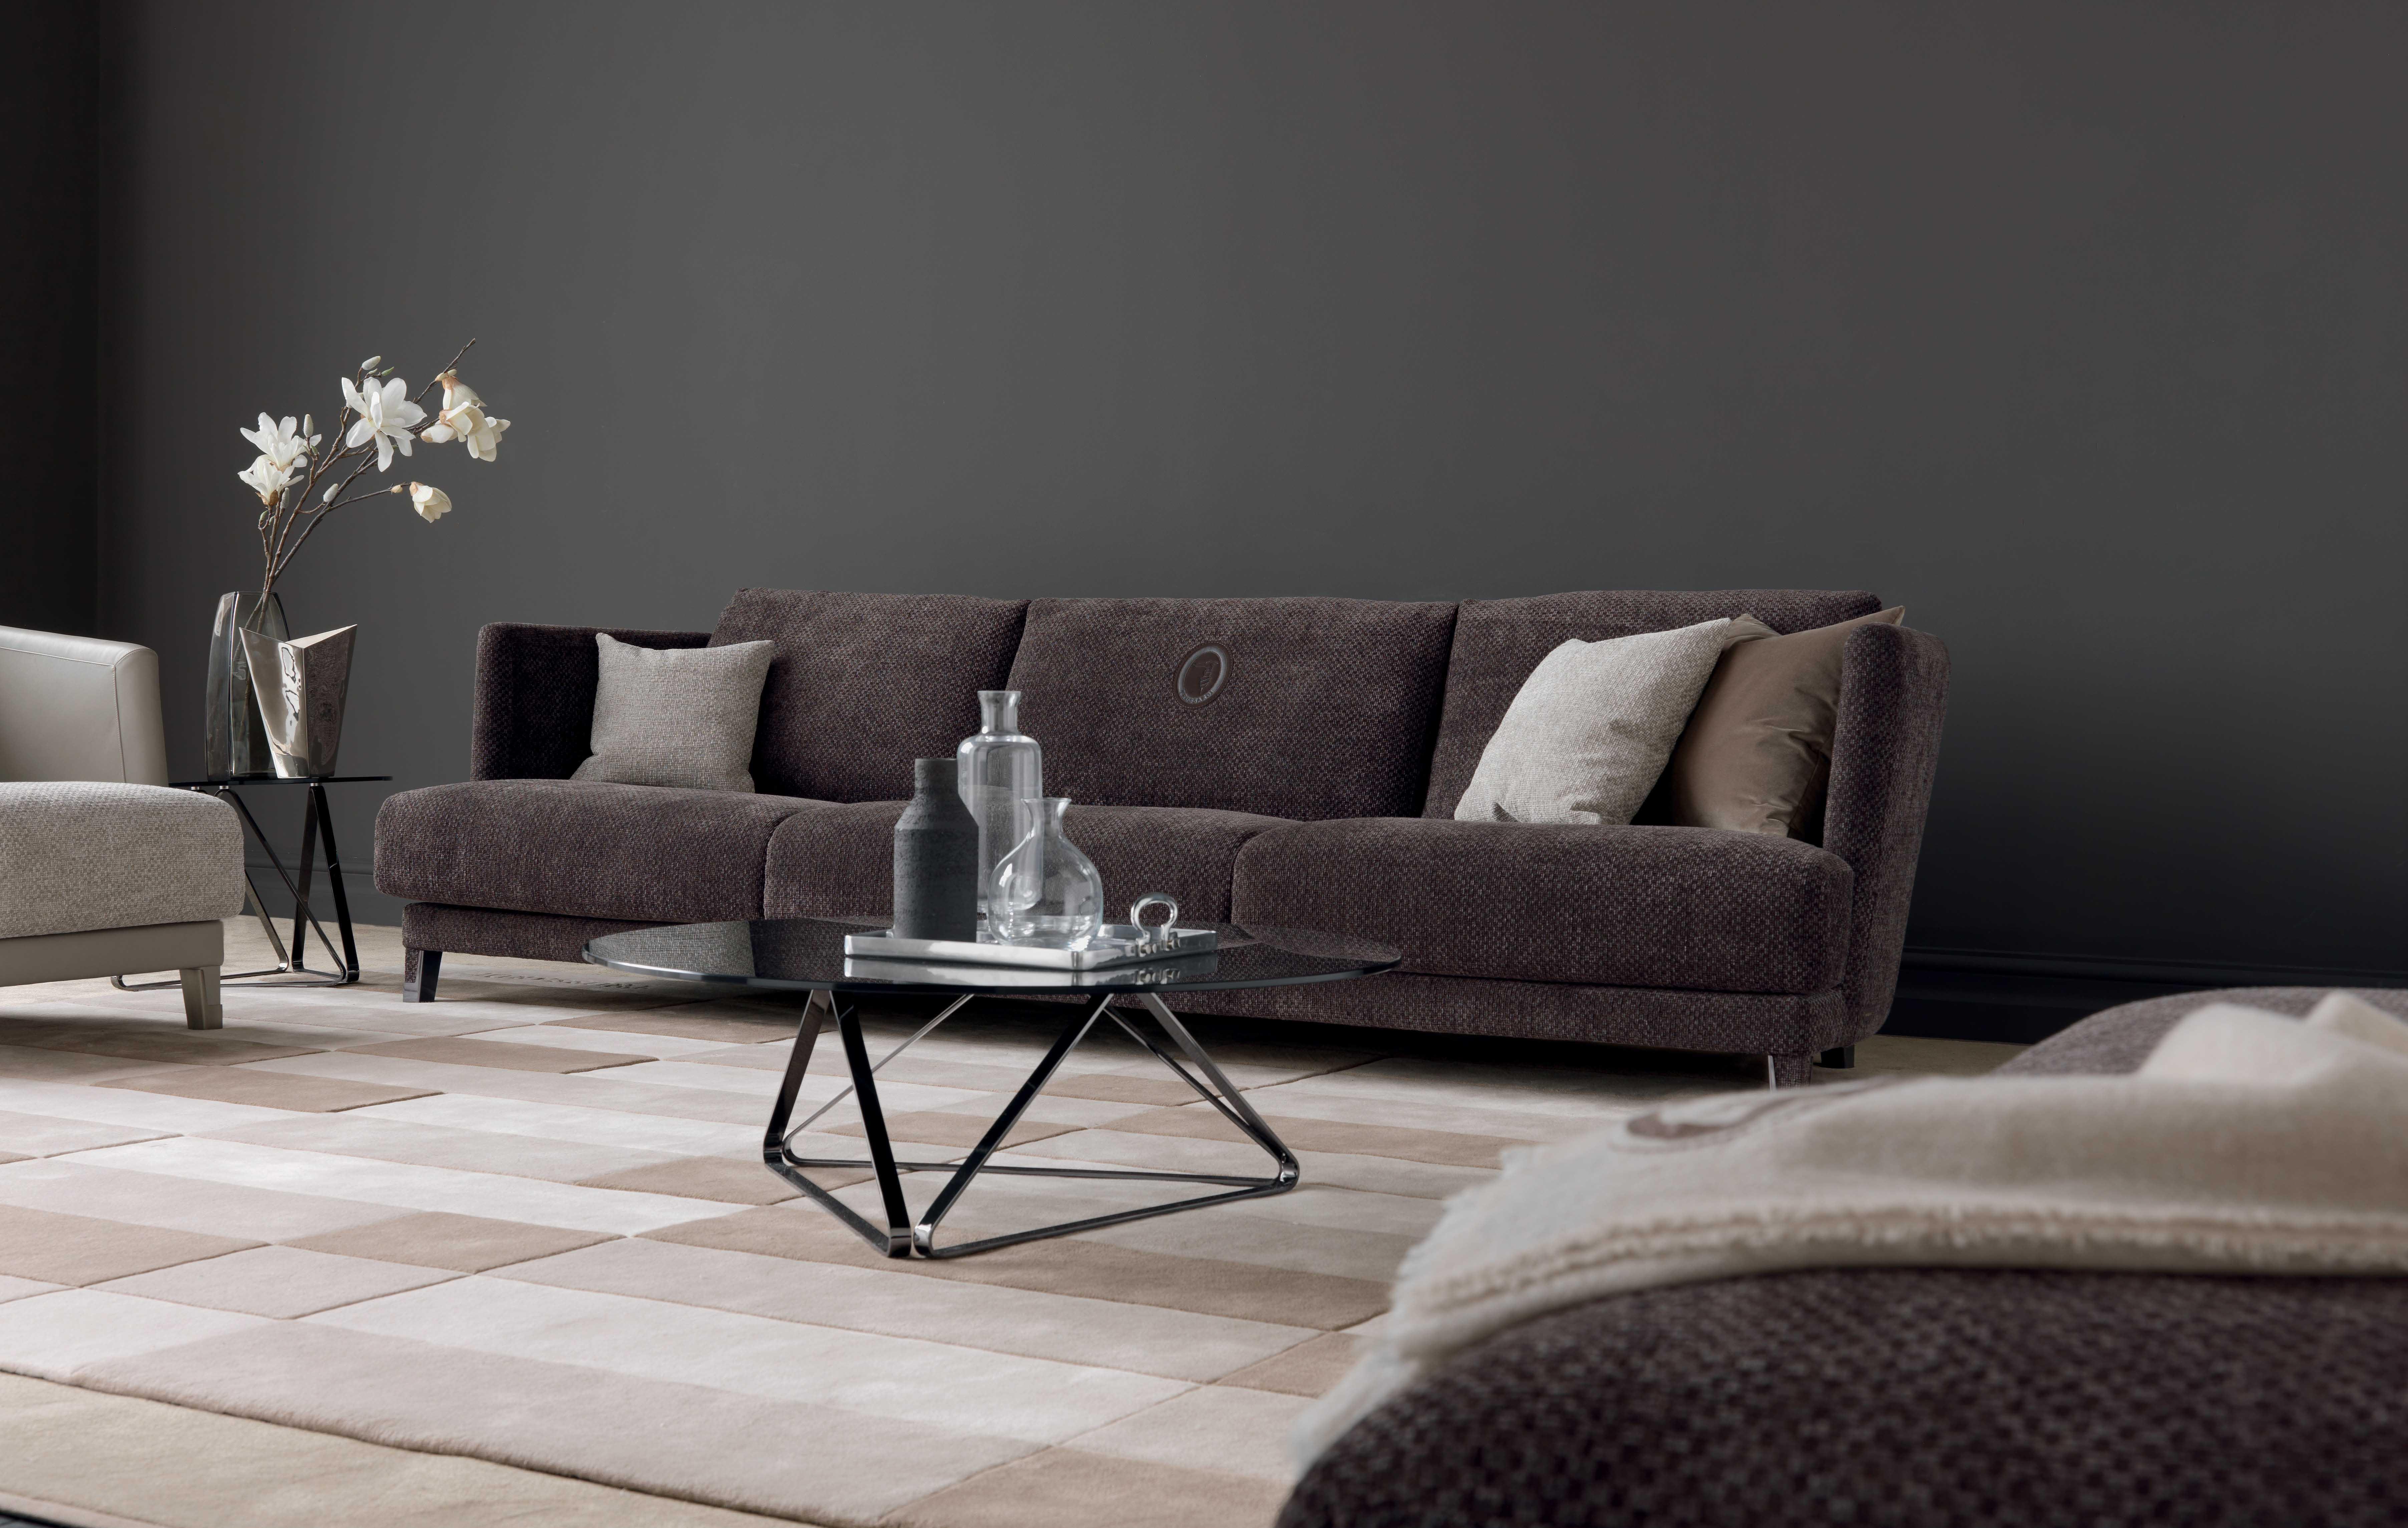 tr-hadel-sofa-and-armchair-tosco-coffee-tables-field-rug